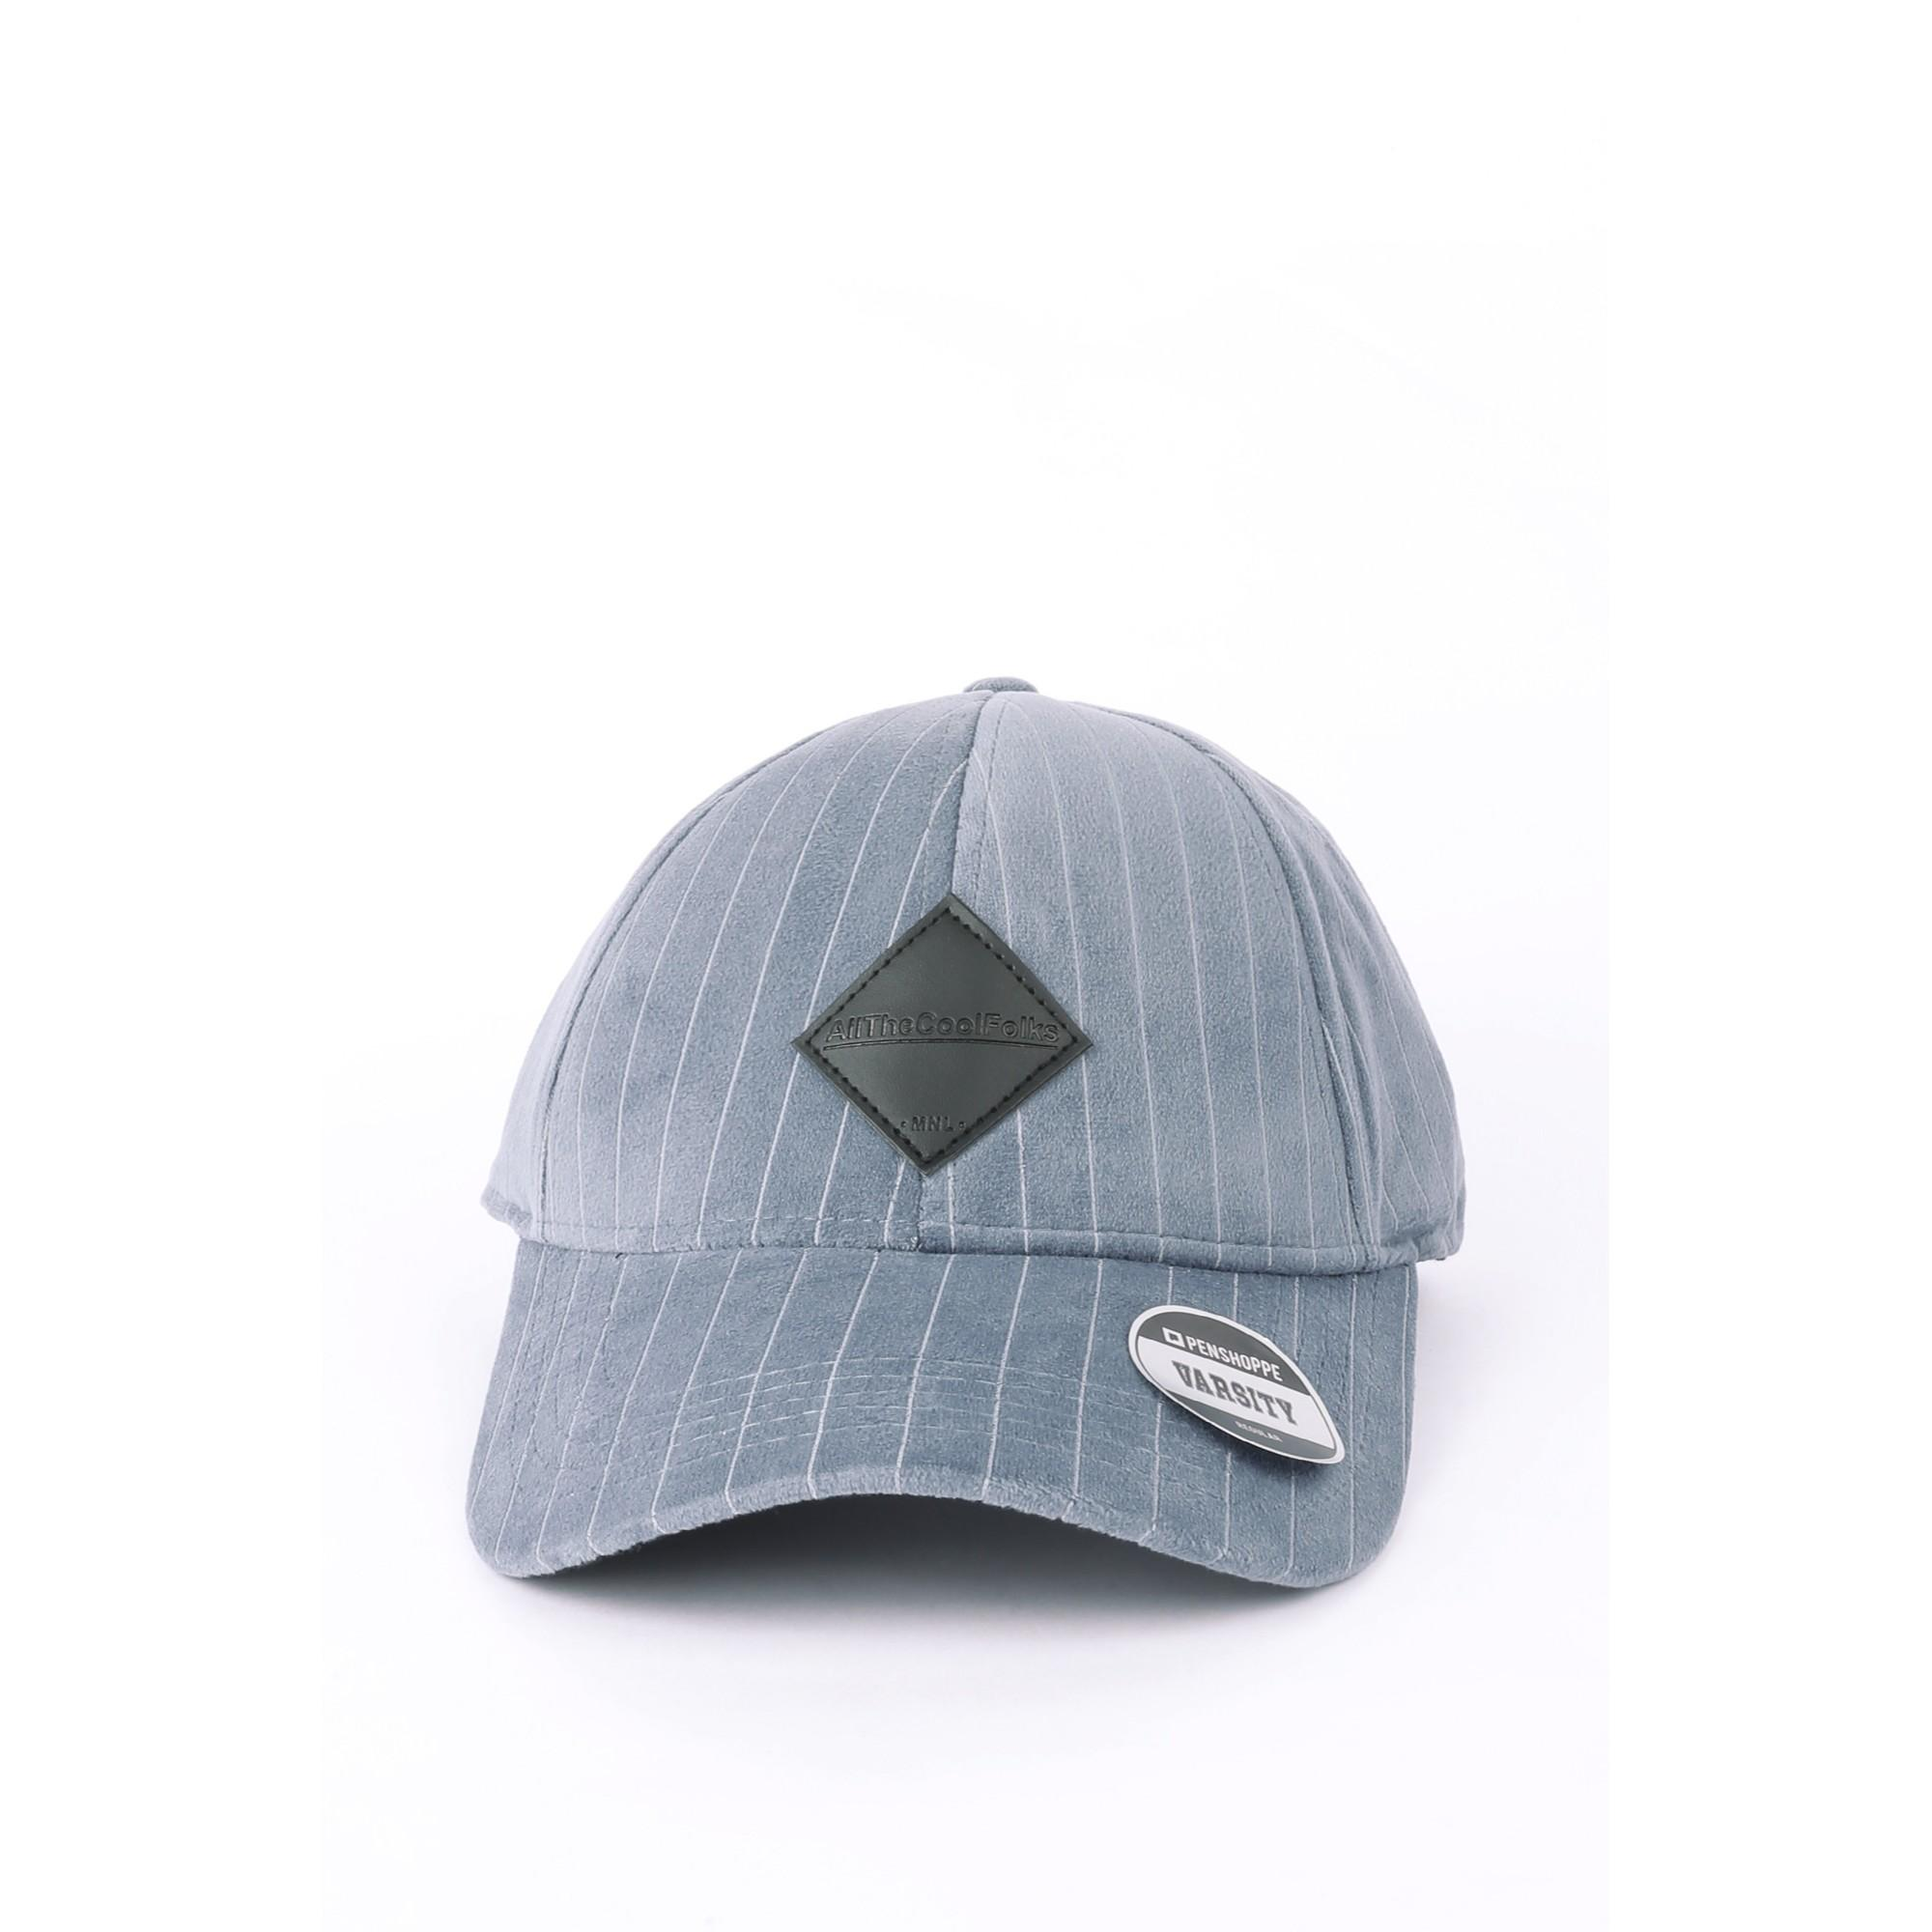 Penshoppe Philippines -Penshoppe Hats for Men for sale - prices ... 64ac640c33a9